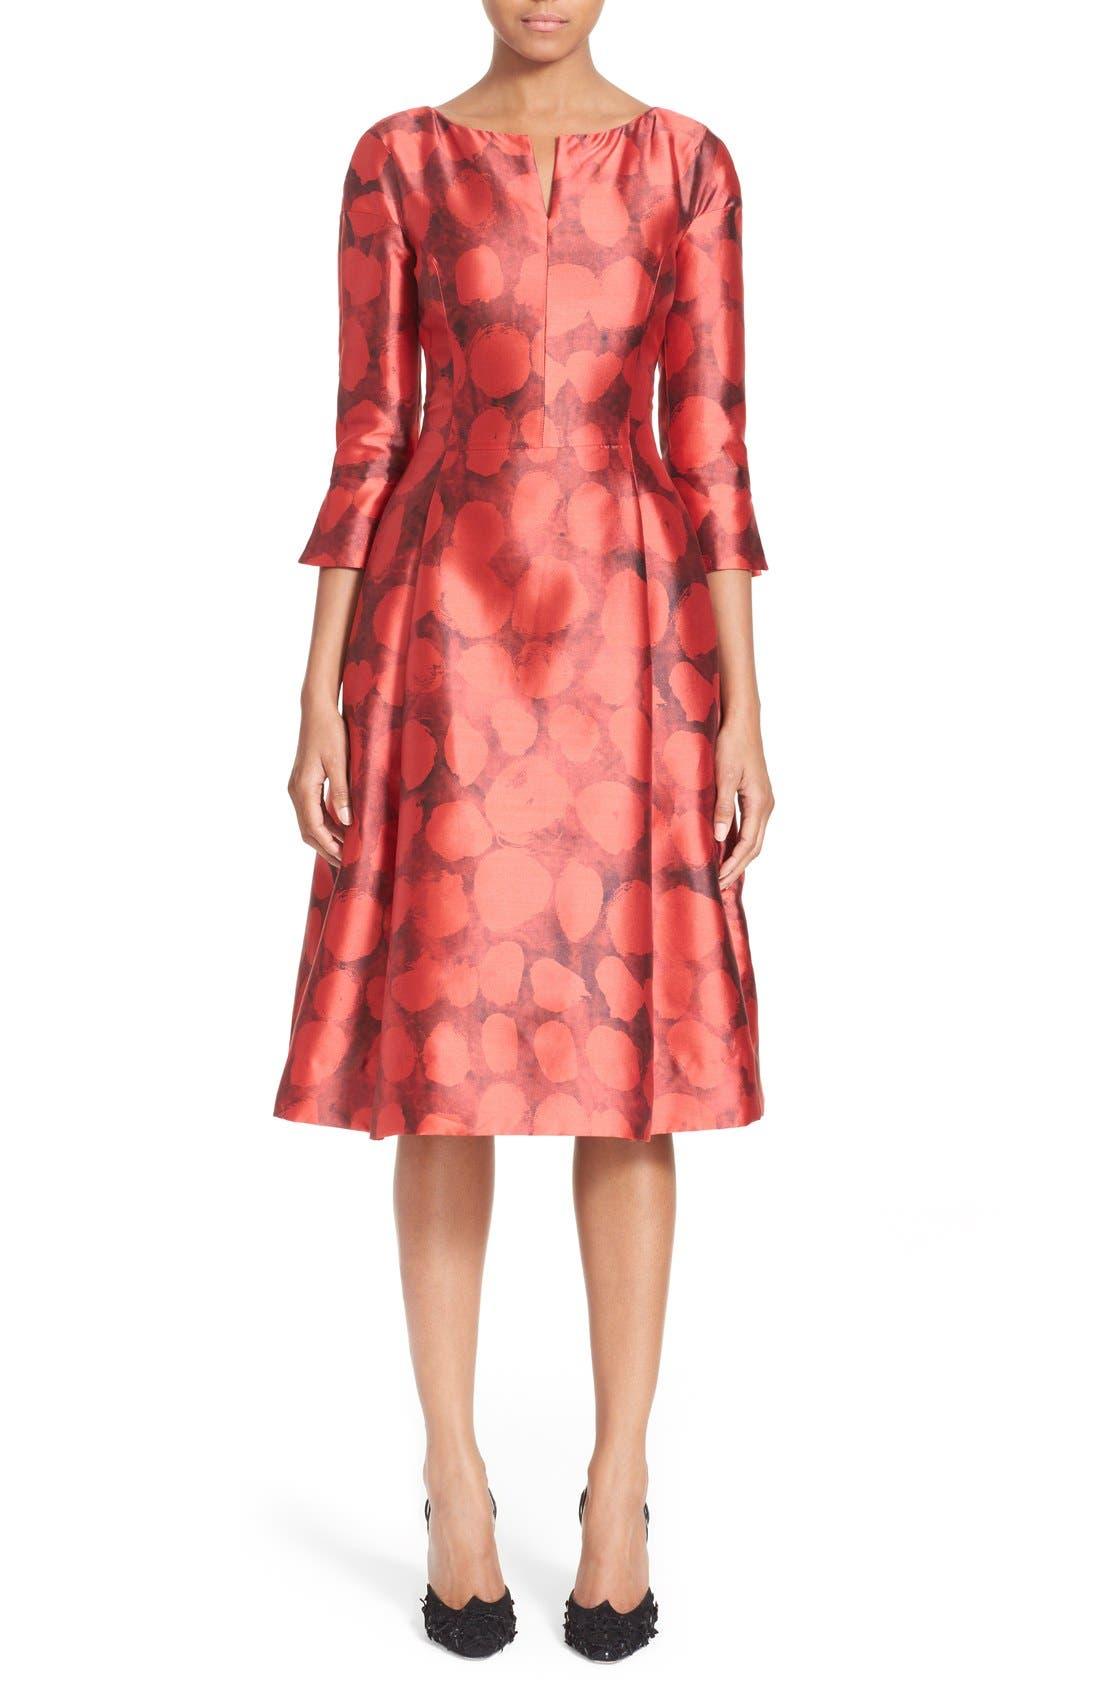 Alternate Image 1 Selected - Oscar de la Renta Dot Print Silk & Cotton Dress